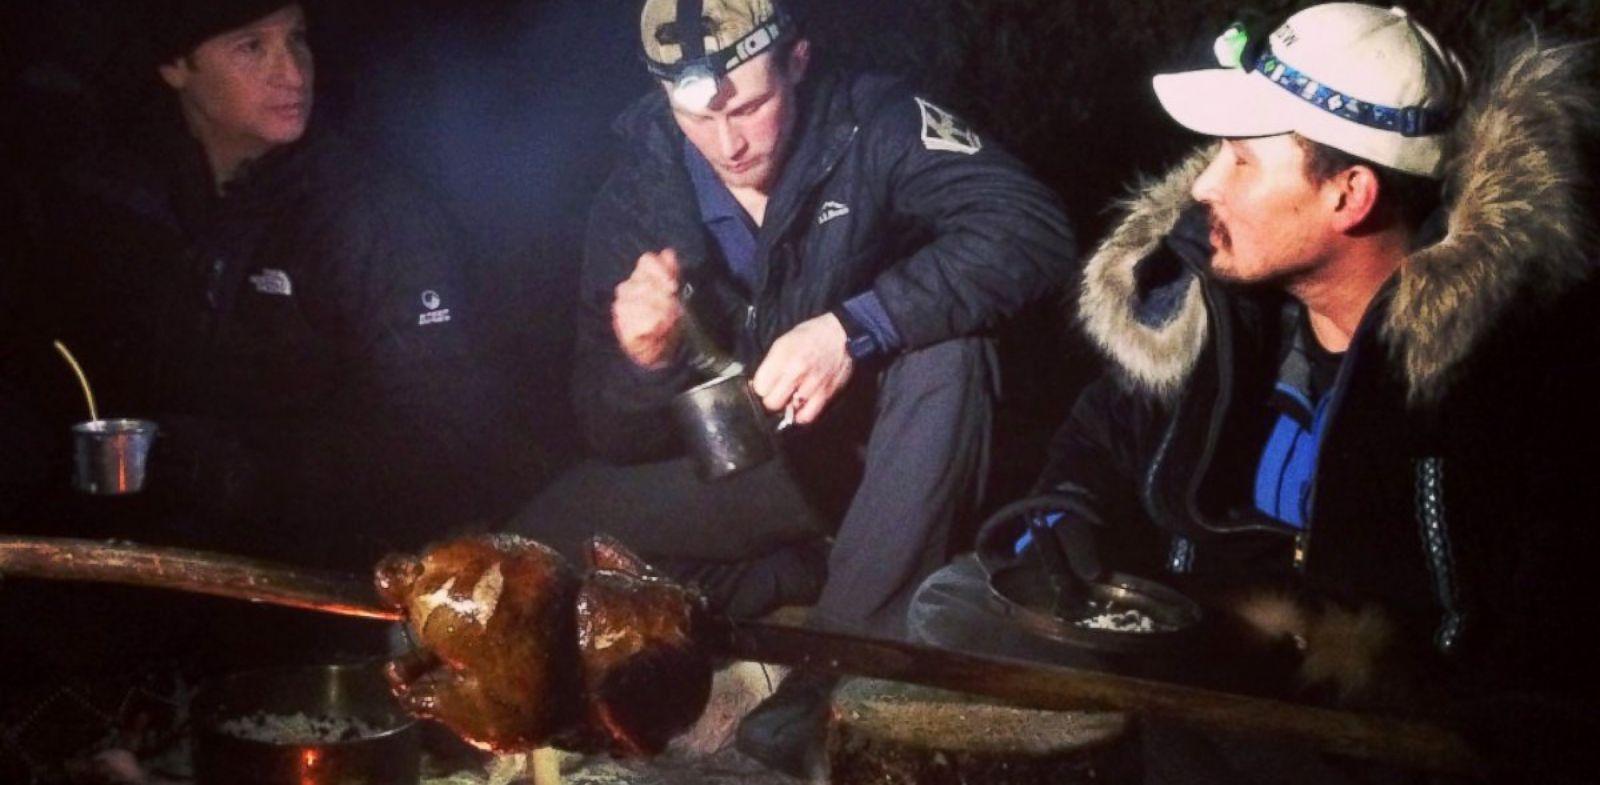 PHOTO: ABCs Neal Karlinsky, left, Dallas Seavey, center, and Eddie Ahyakak, right, sit around a campfire in the Alaskan wilderness.